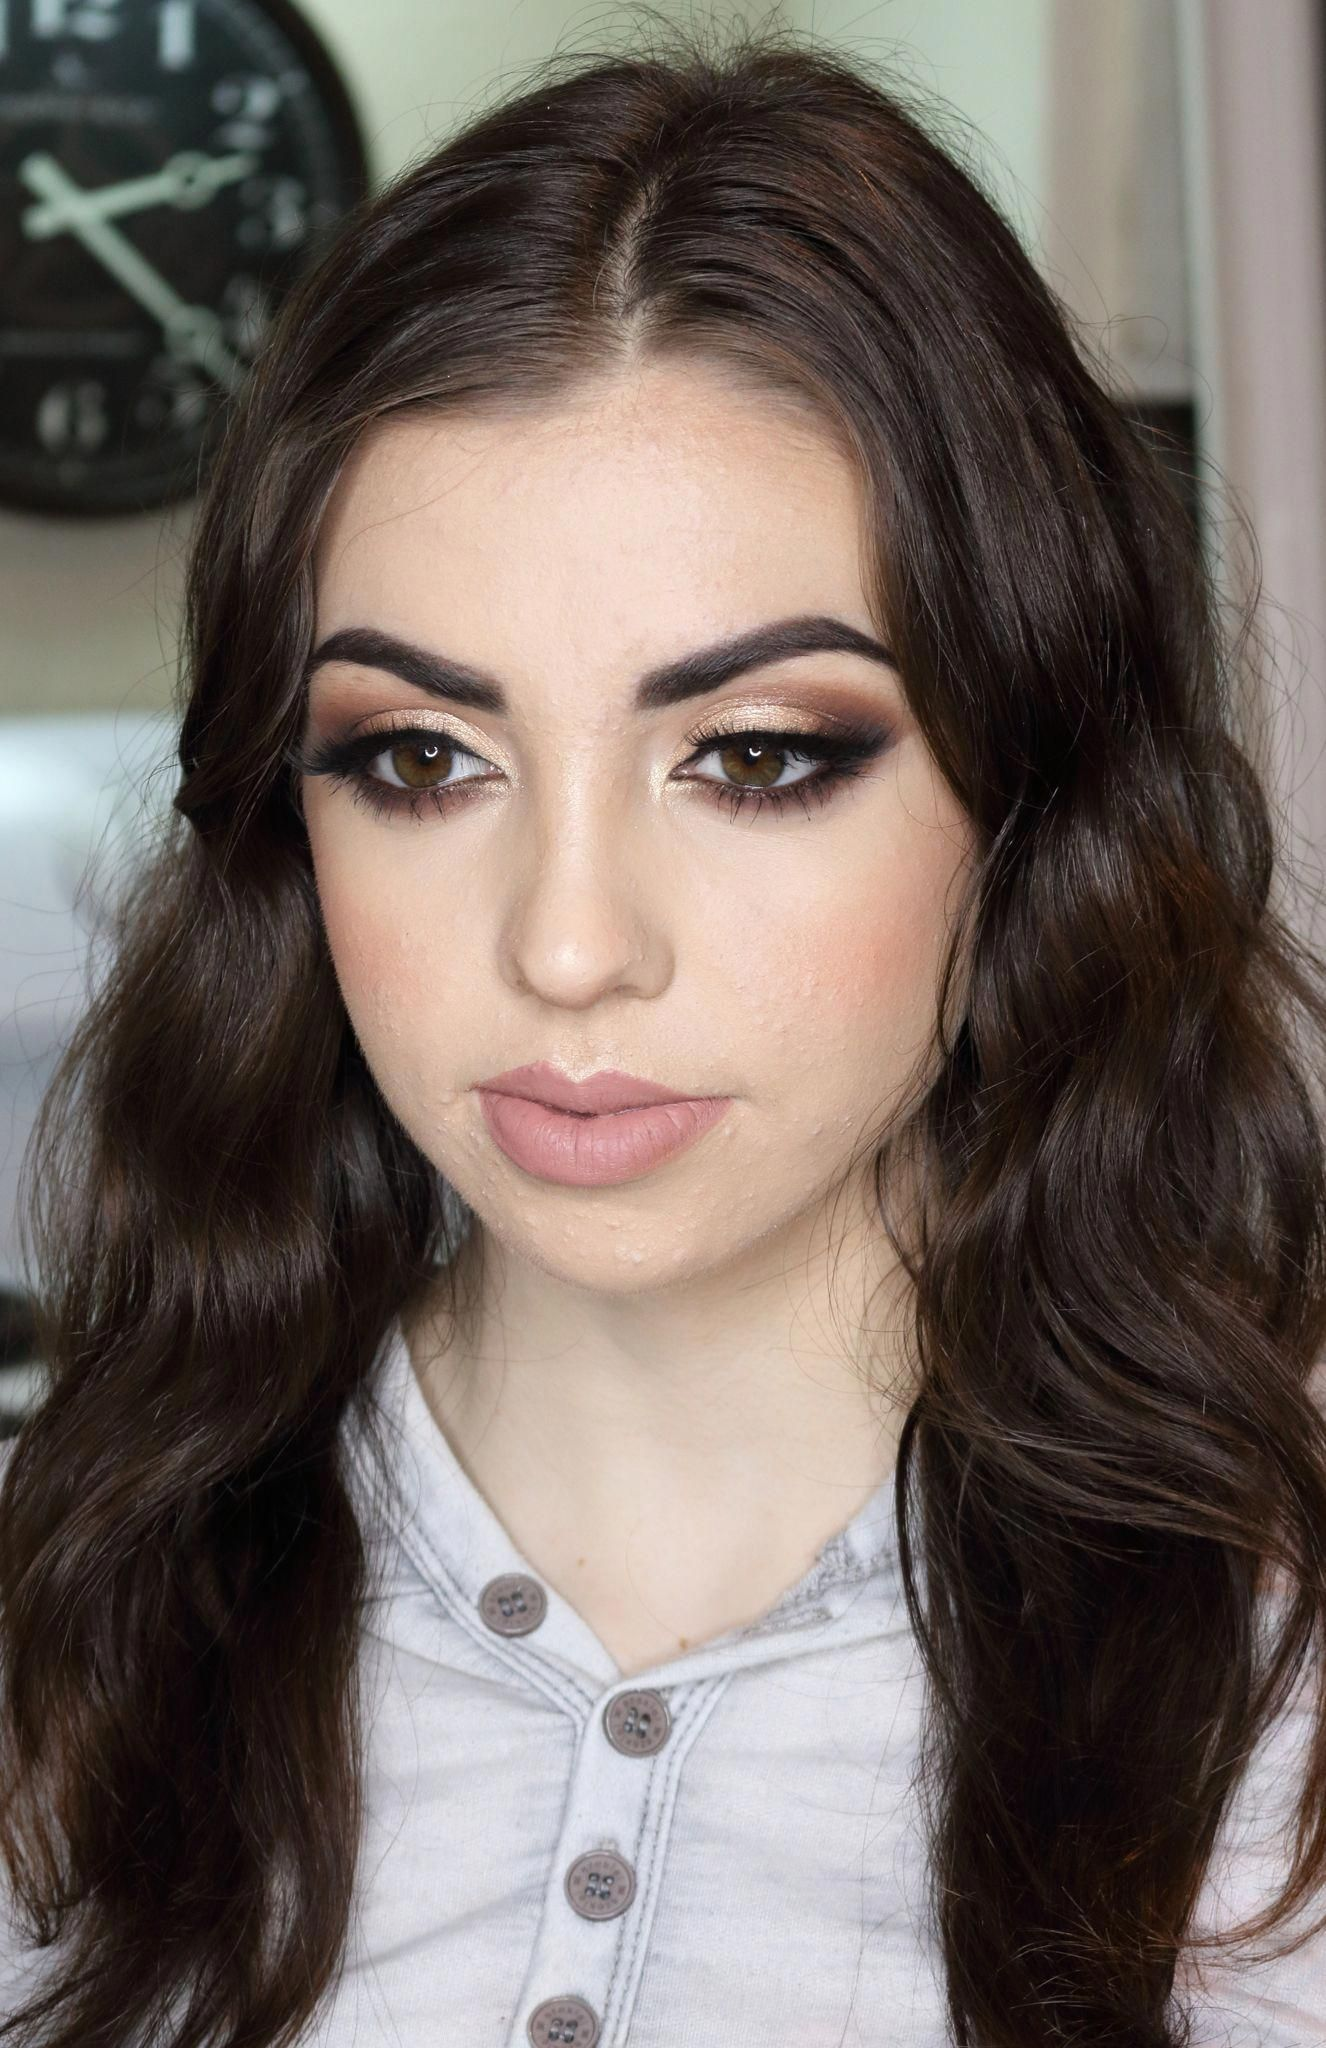 Dramatic Eye Makeup Purple Makeup Artist Miami Dramatic